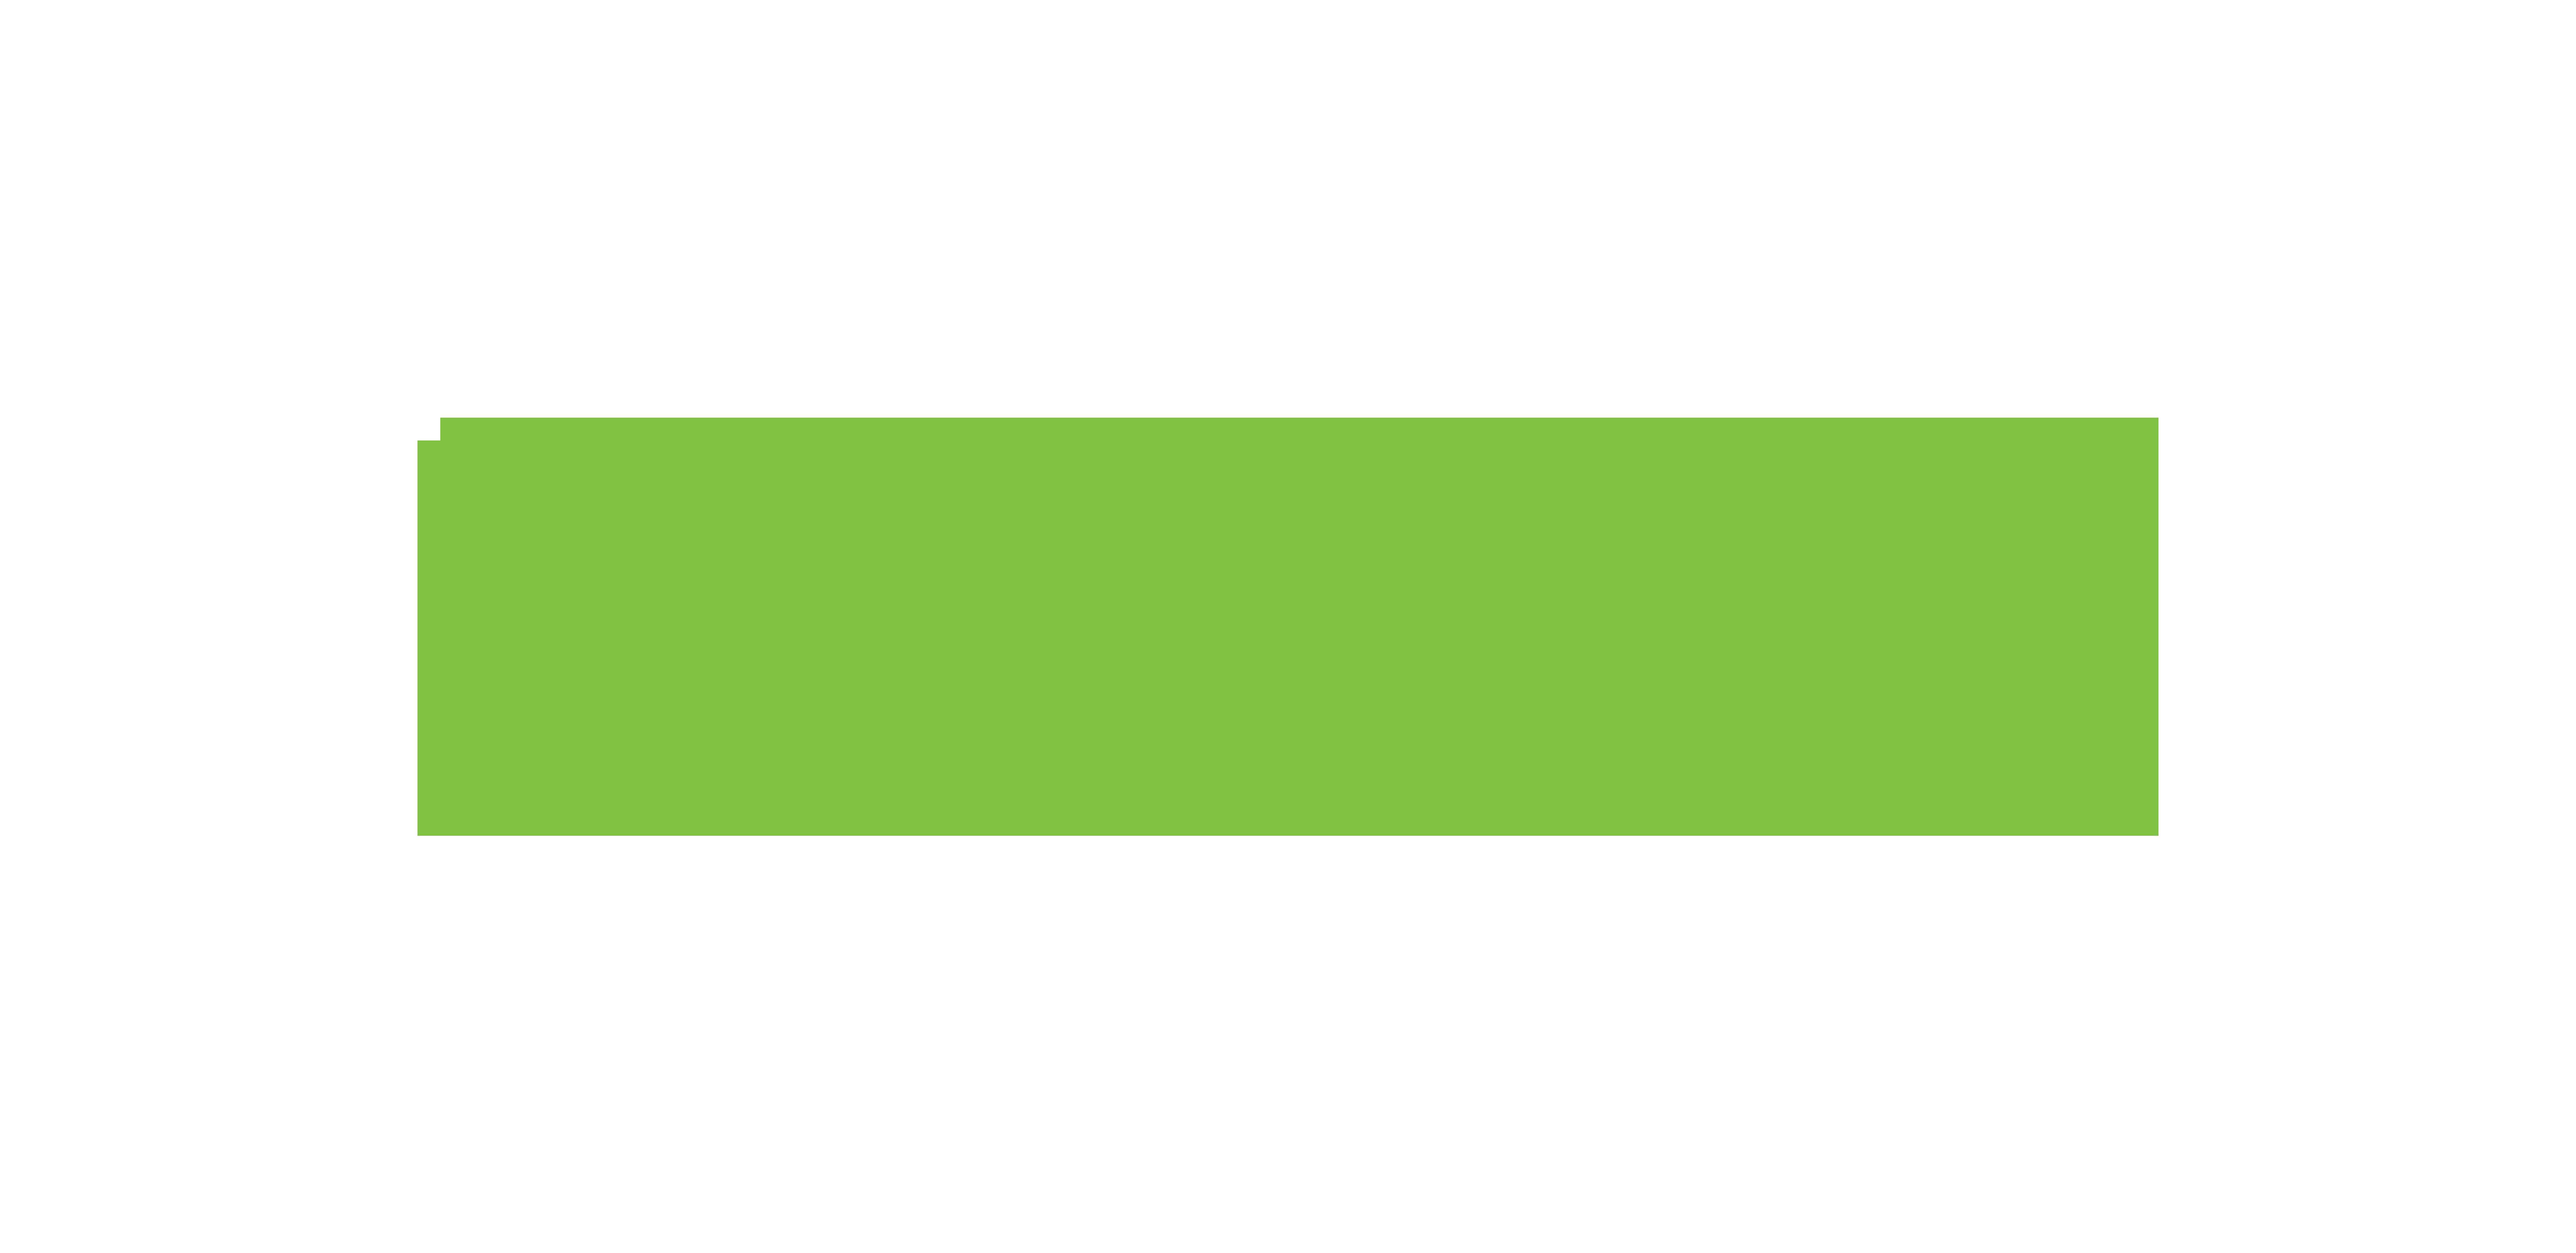 Acer-logo-digital-green